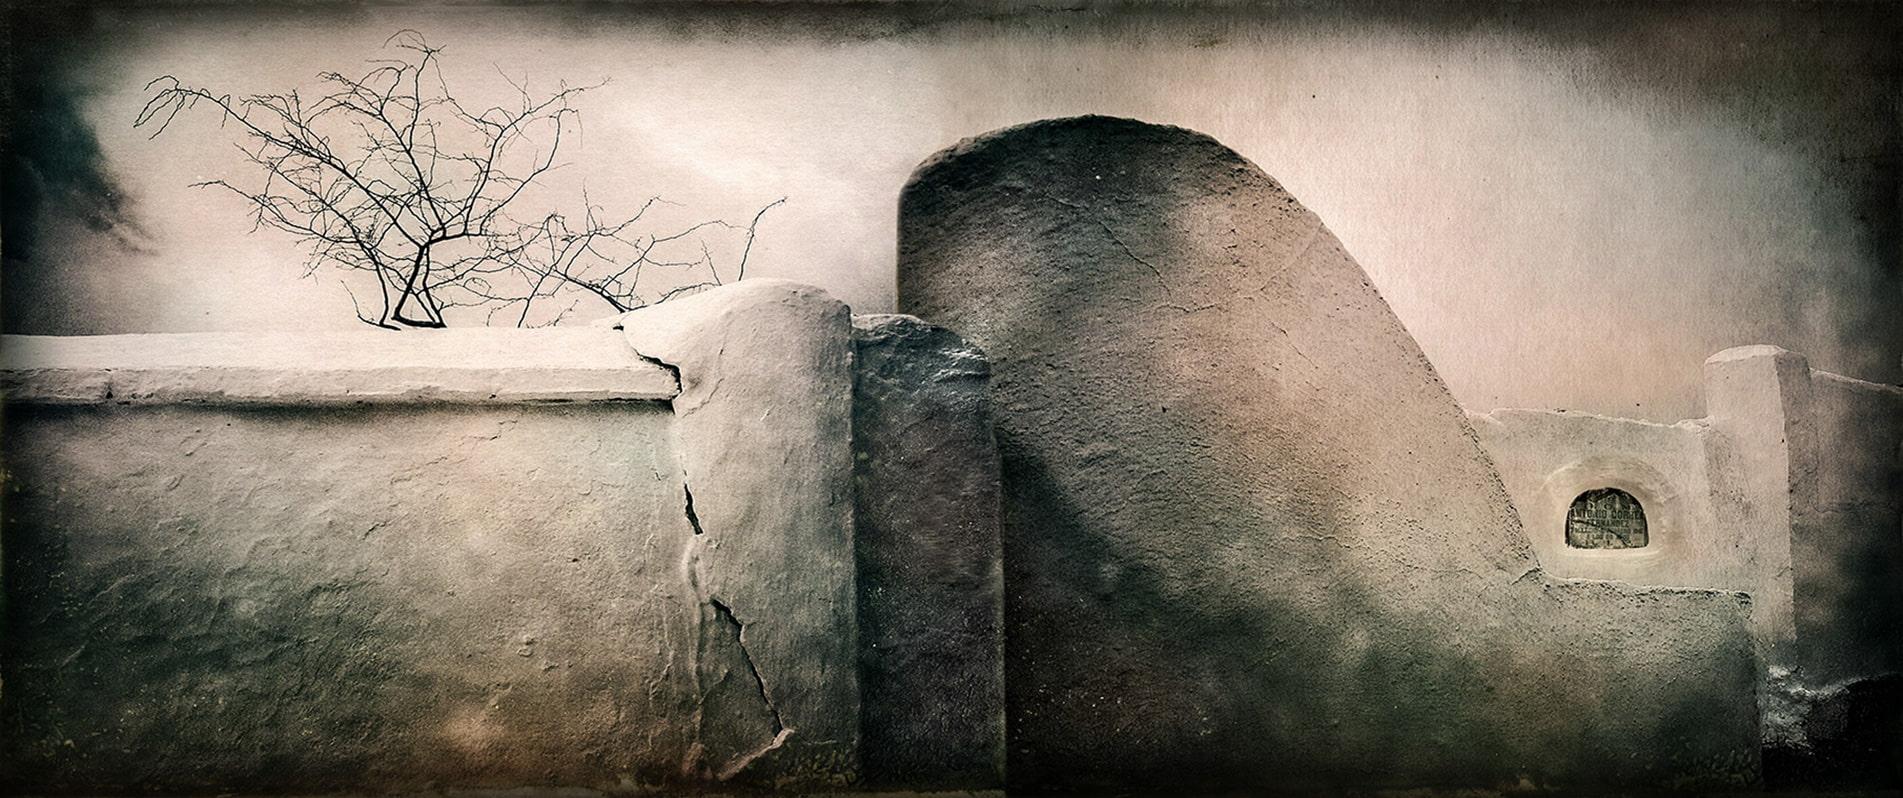 oblivion-torres-tabanera-1903x798